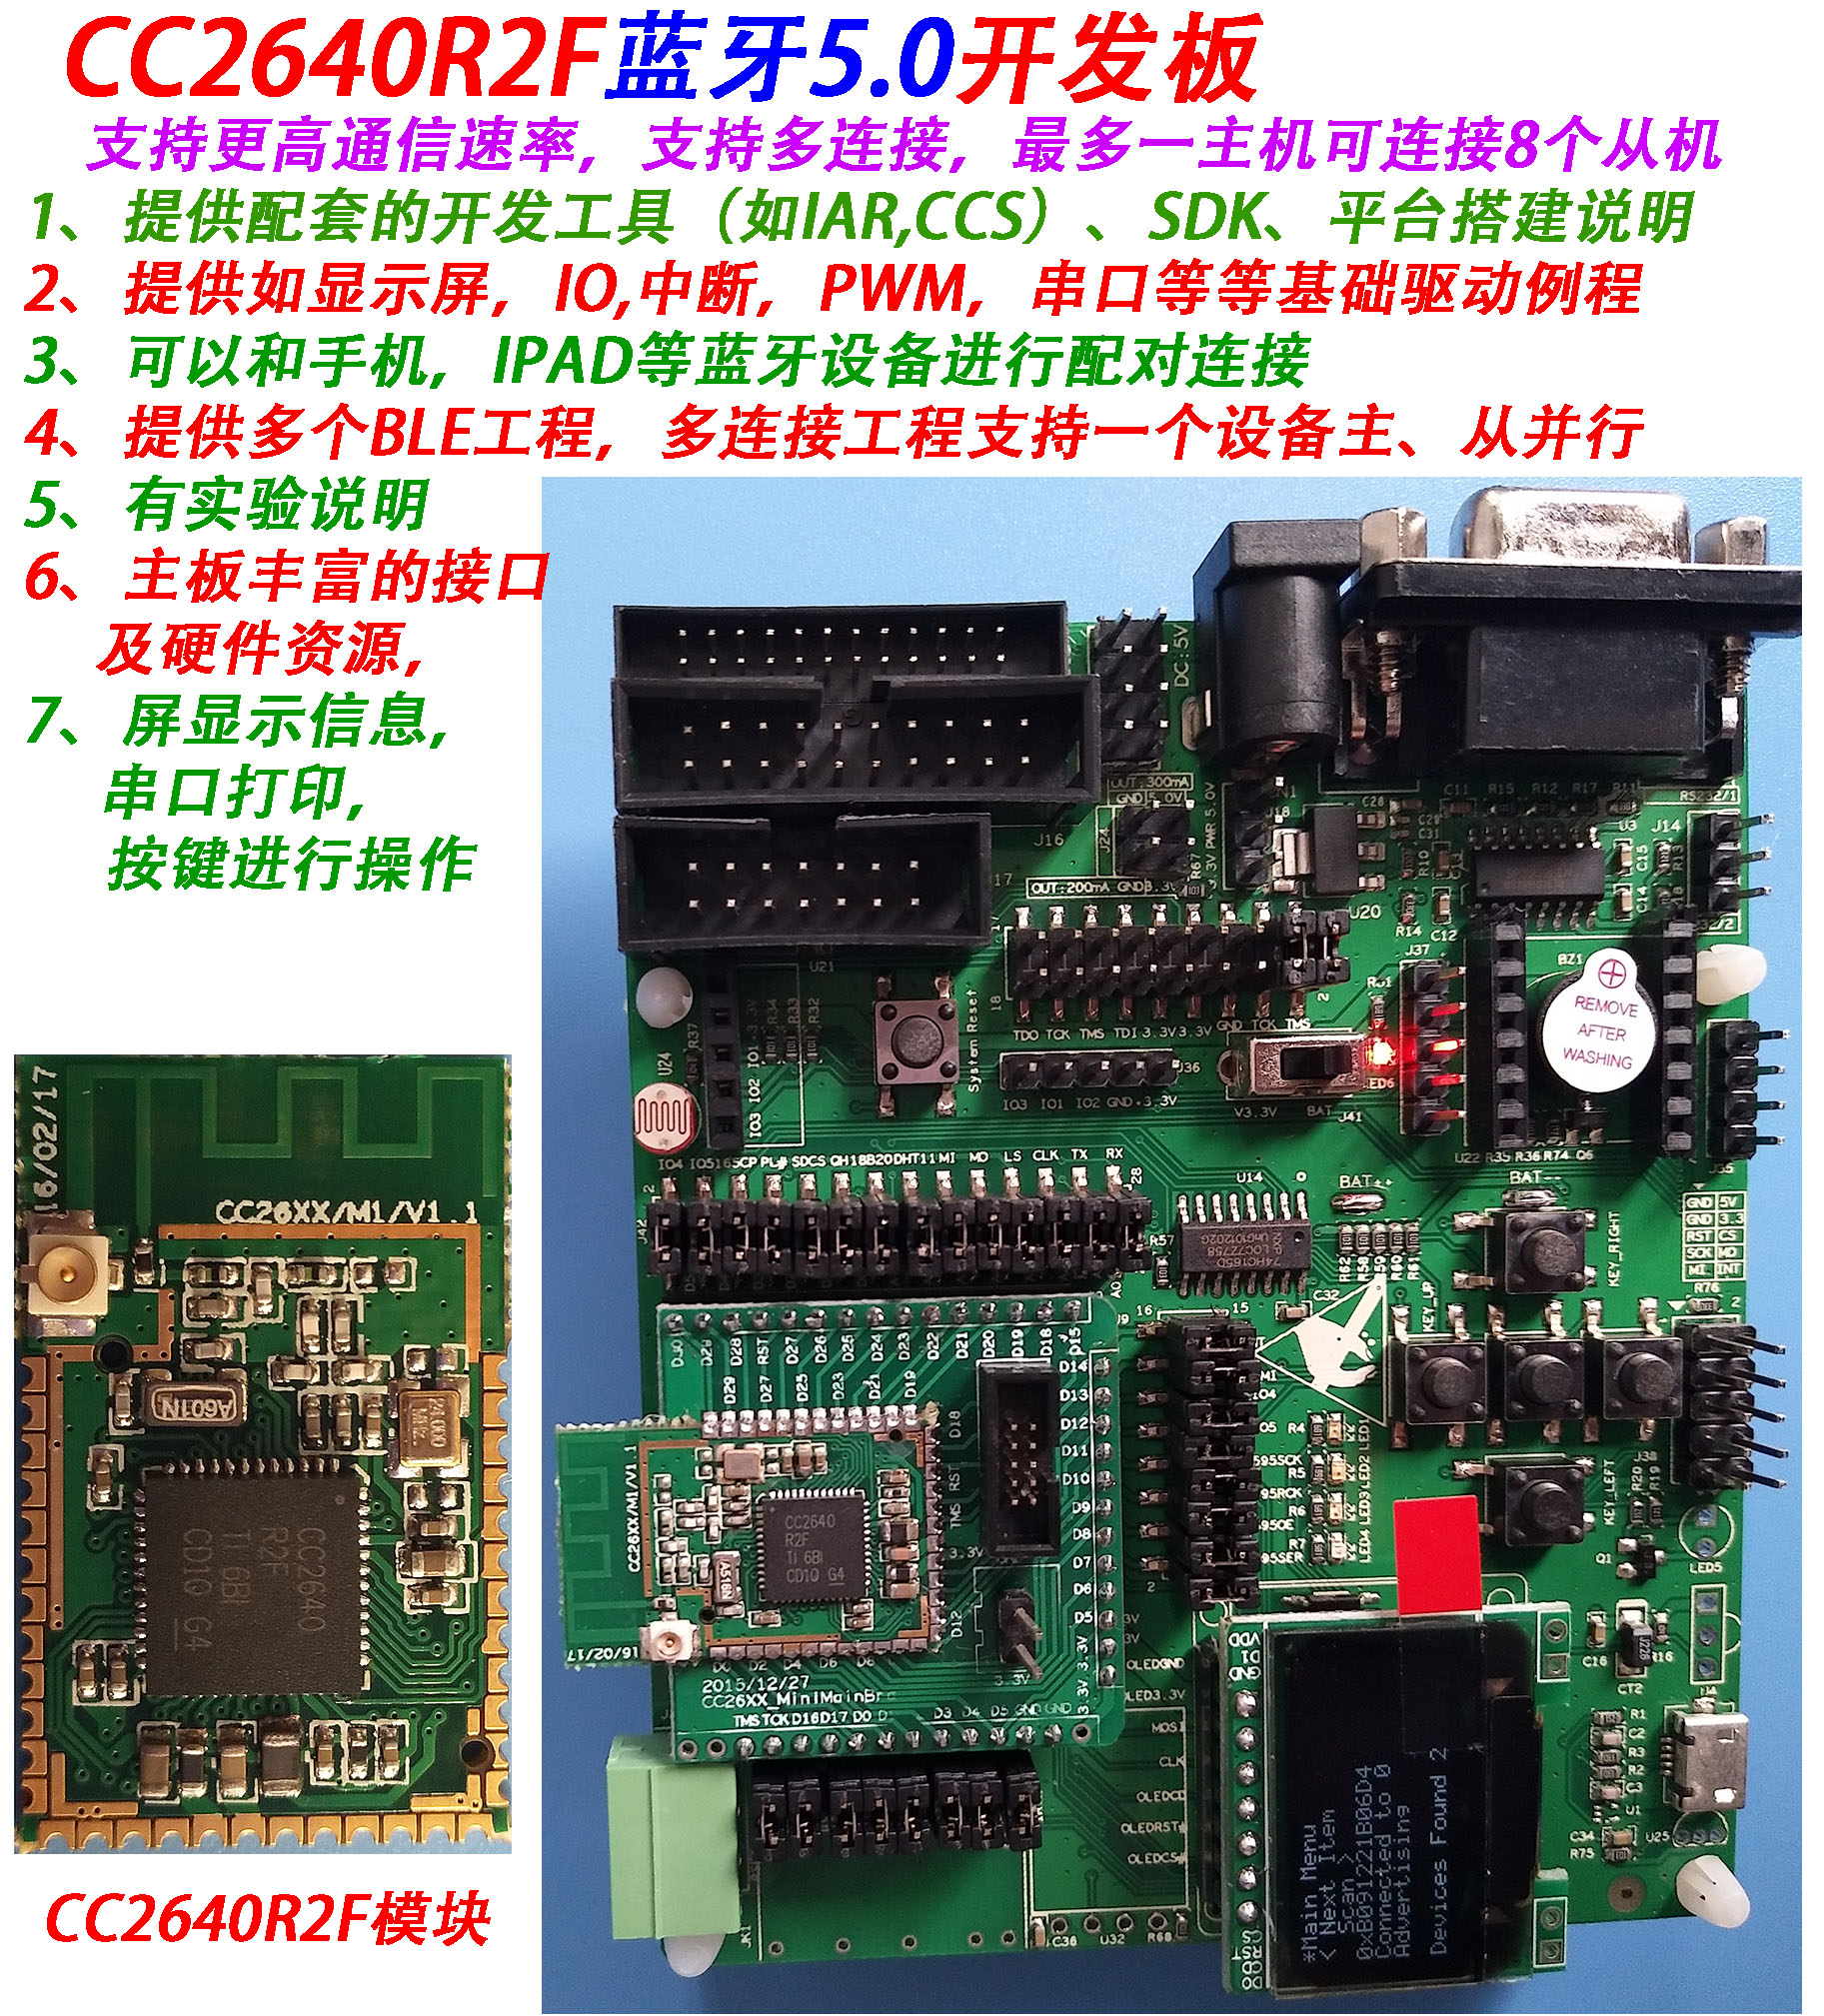 CC2640R2F module, CC2640R2 development board, support Bluetooth 5, Bluetooth 4.2 module xilinx xc3s500e spartan 3e fpga development evaluation board lcd1602 lcd12864 12 module open3s500e package b